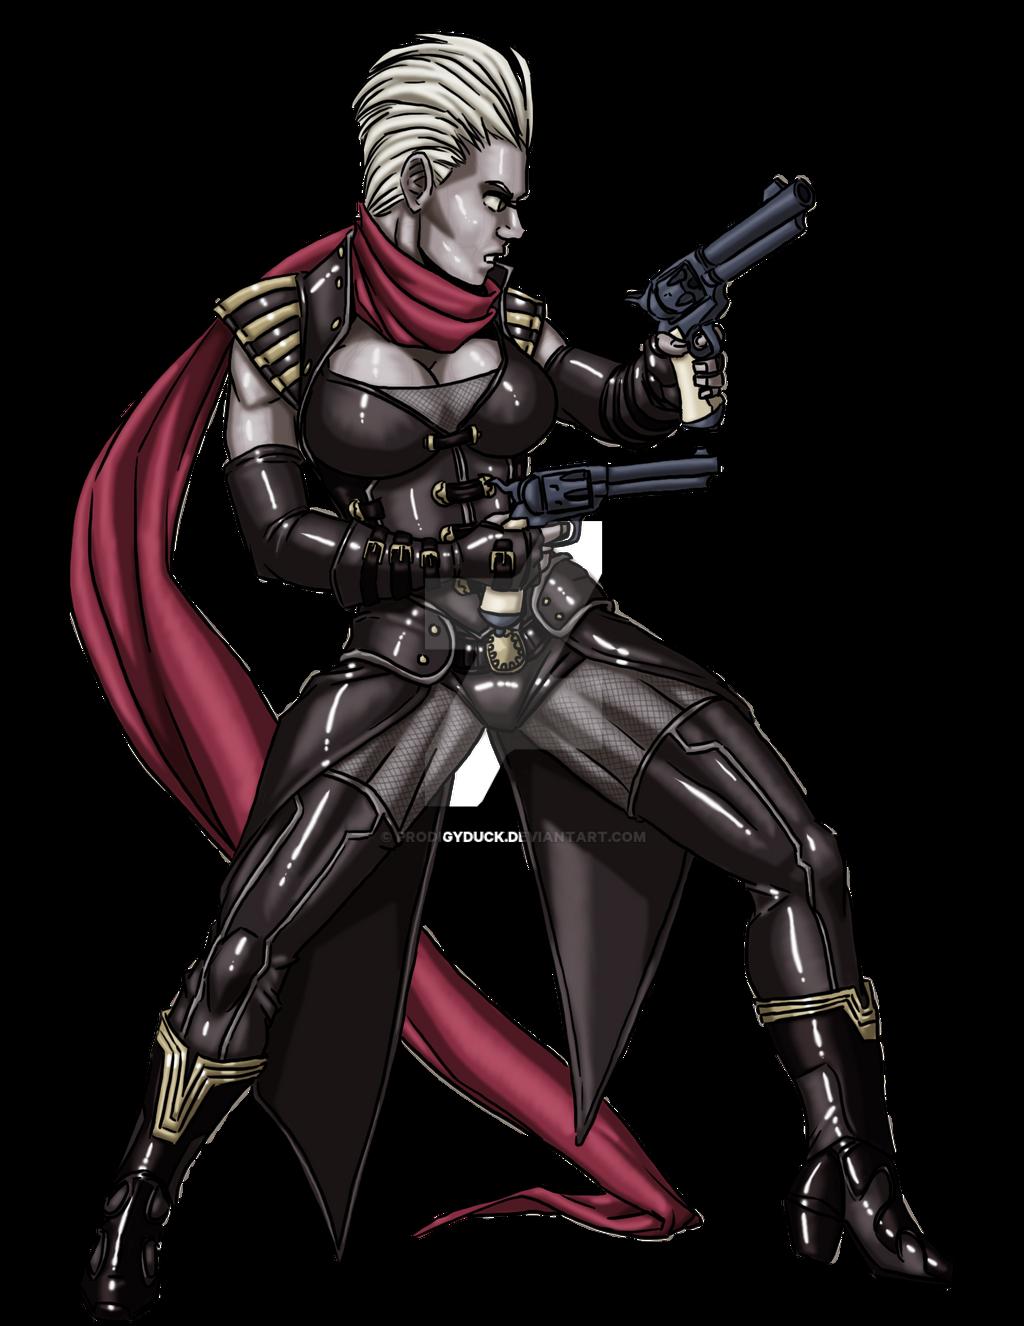 Oread Gunslinger by ProdigyDuck on DeviantArt